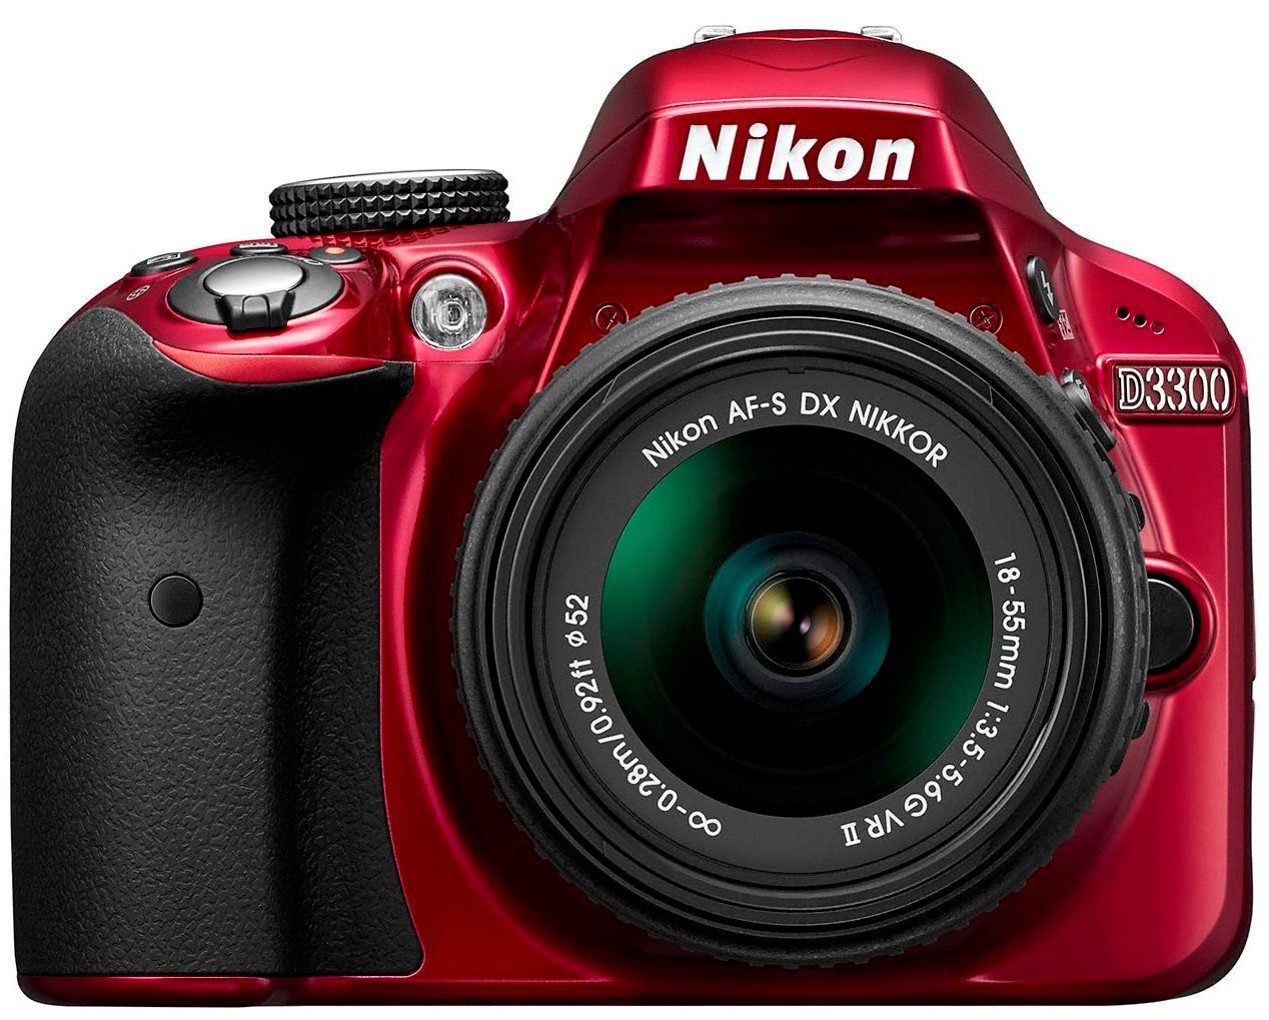 Nikon D3300 DSLR  1855mm VR II Lens  Red